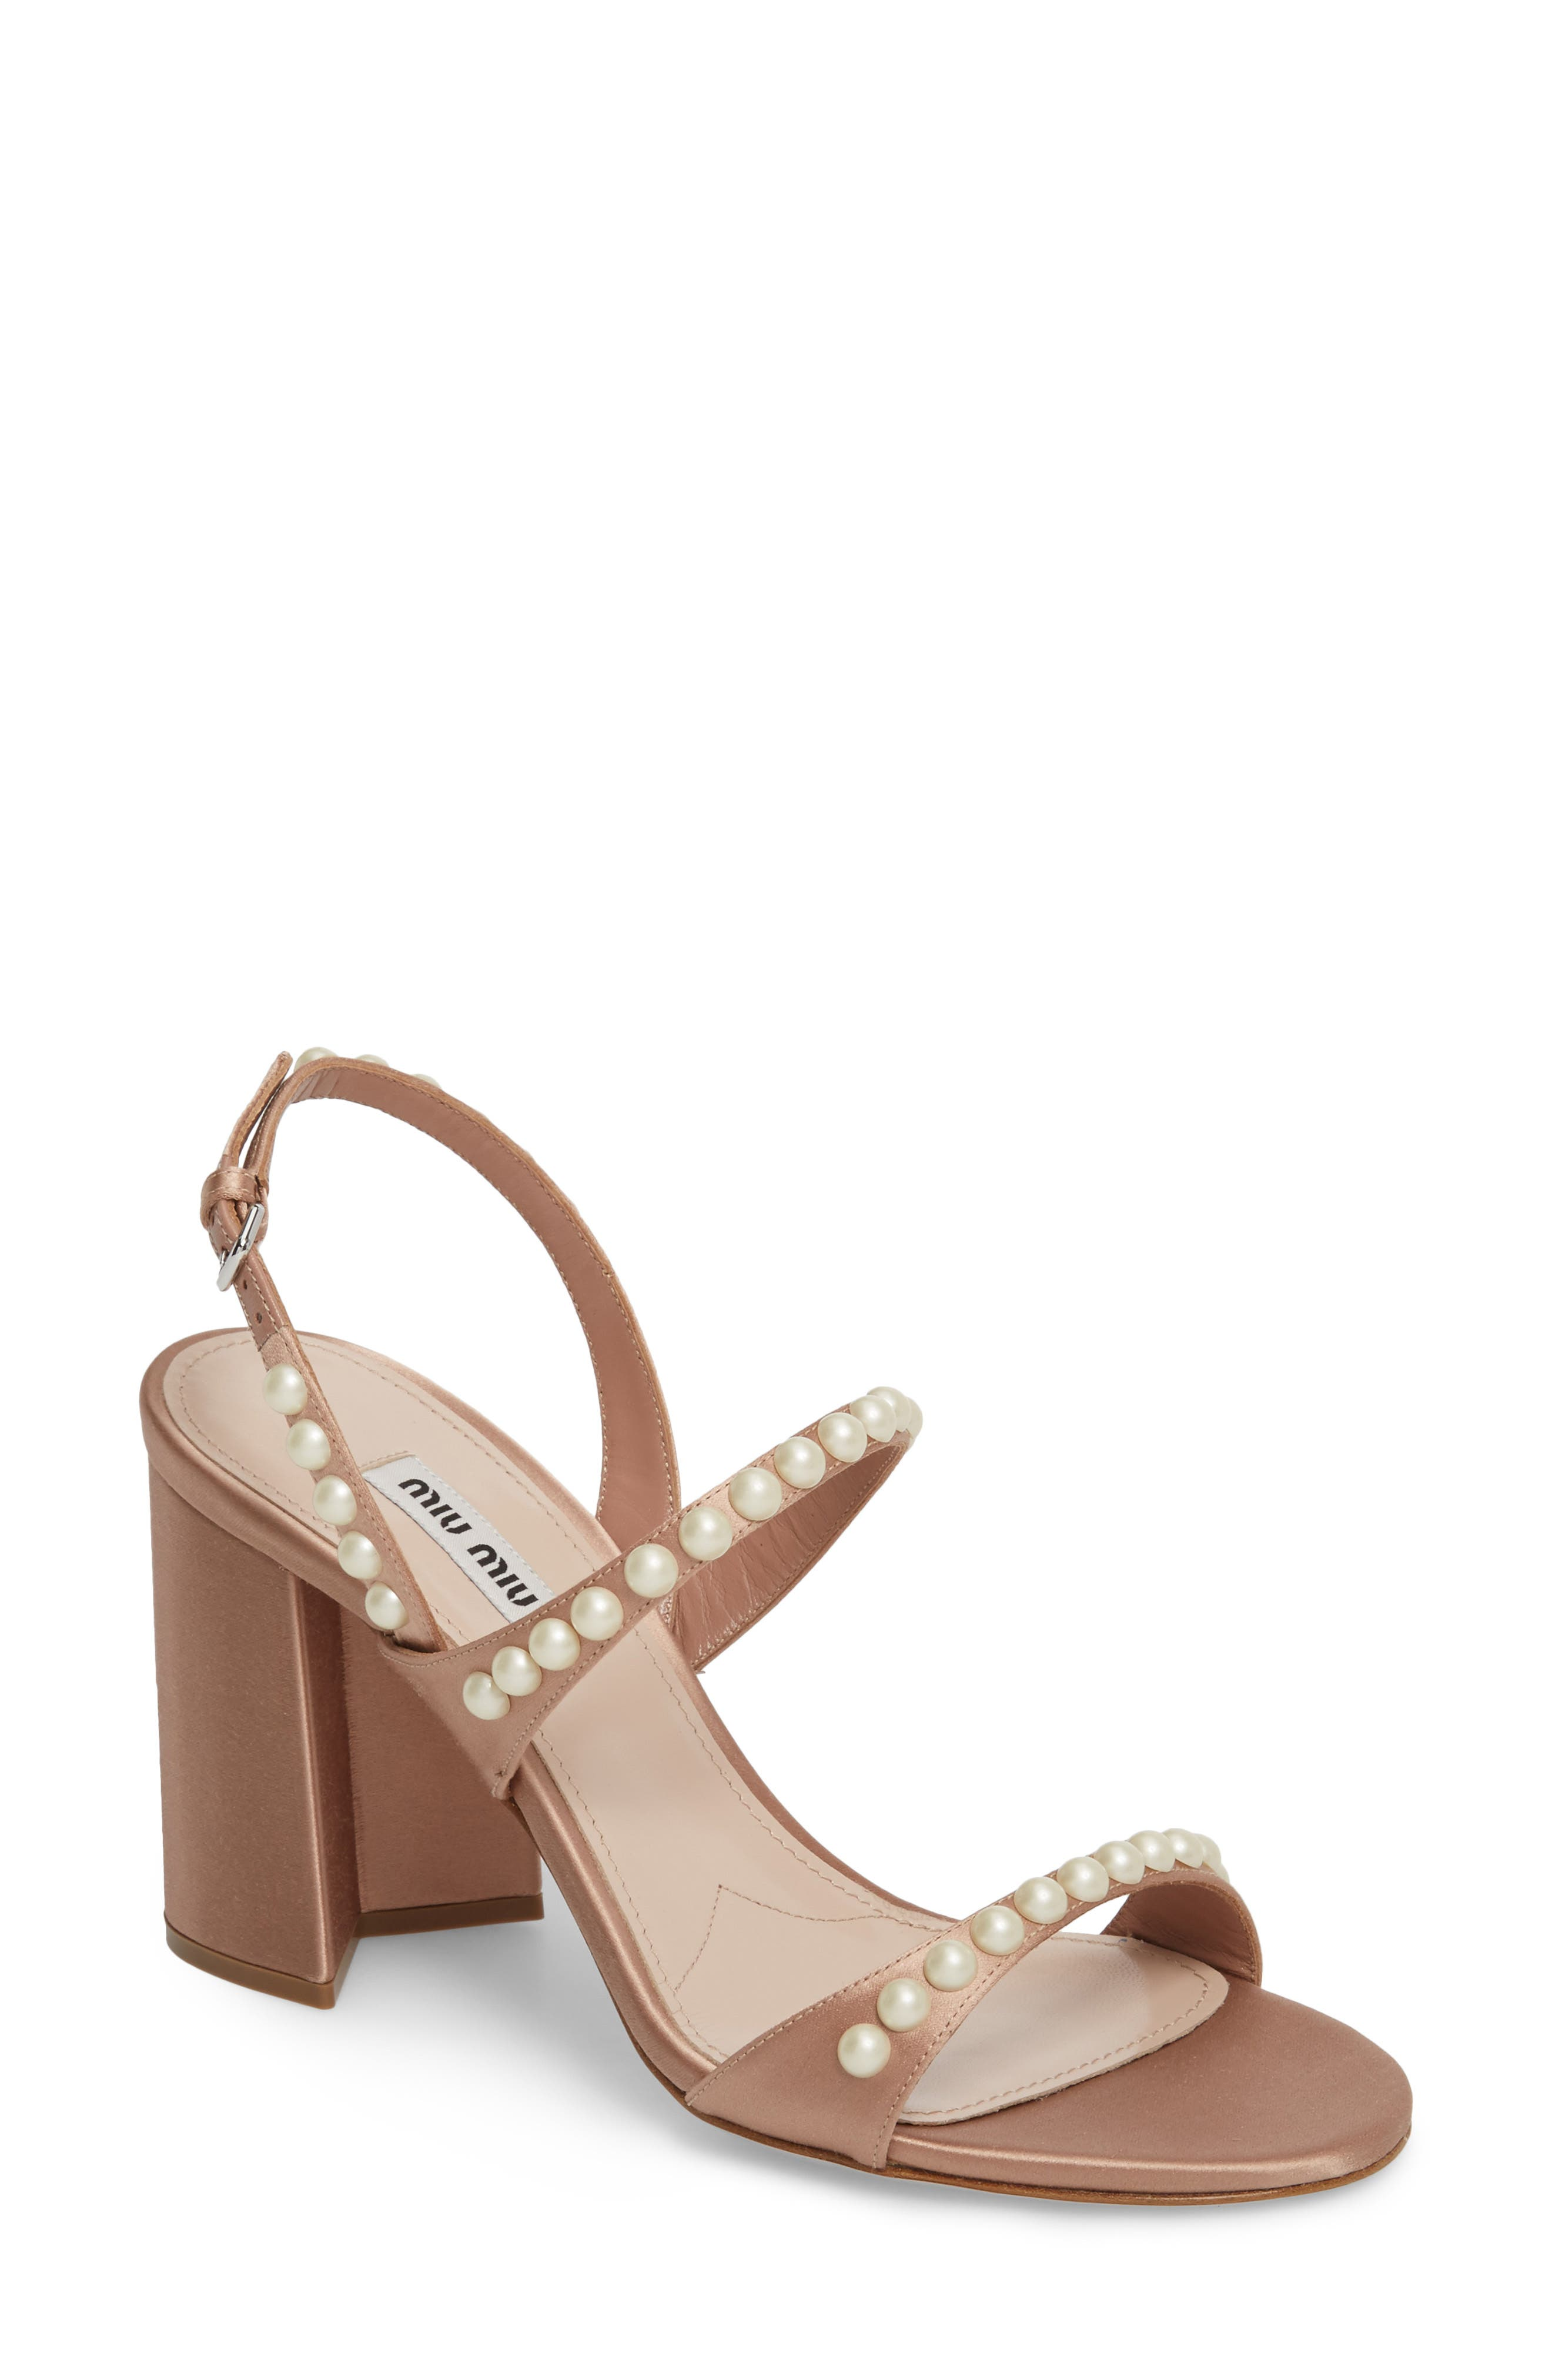 Miu Miu Imitation Pearl Slingback Sandal (Women)